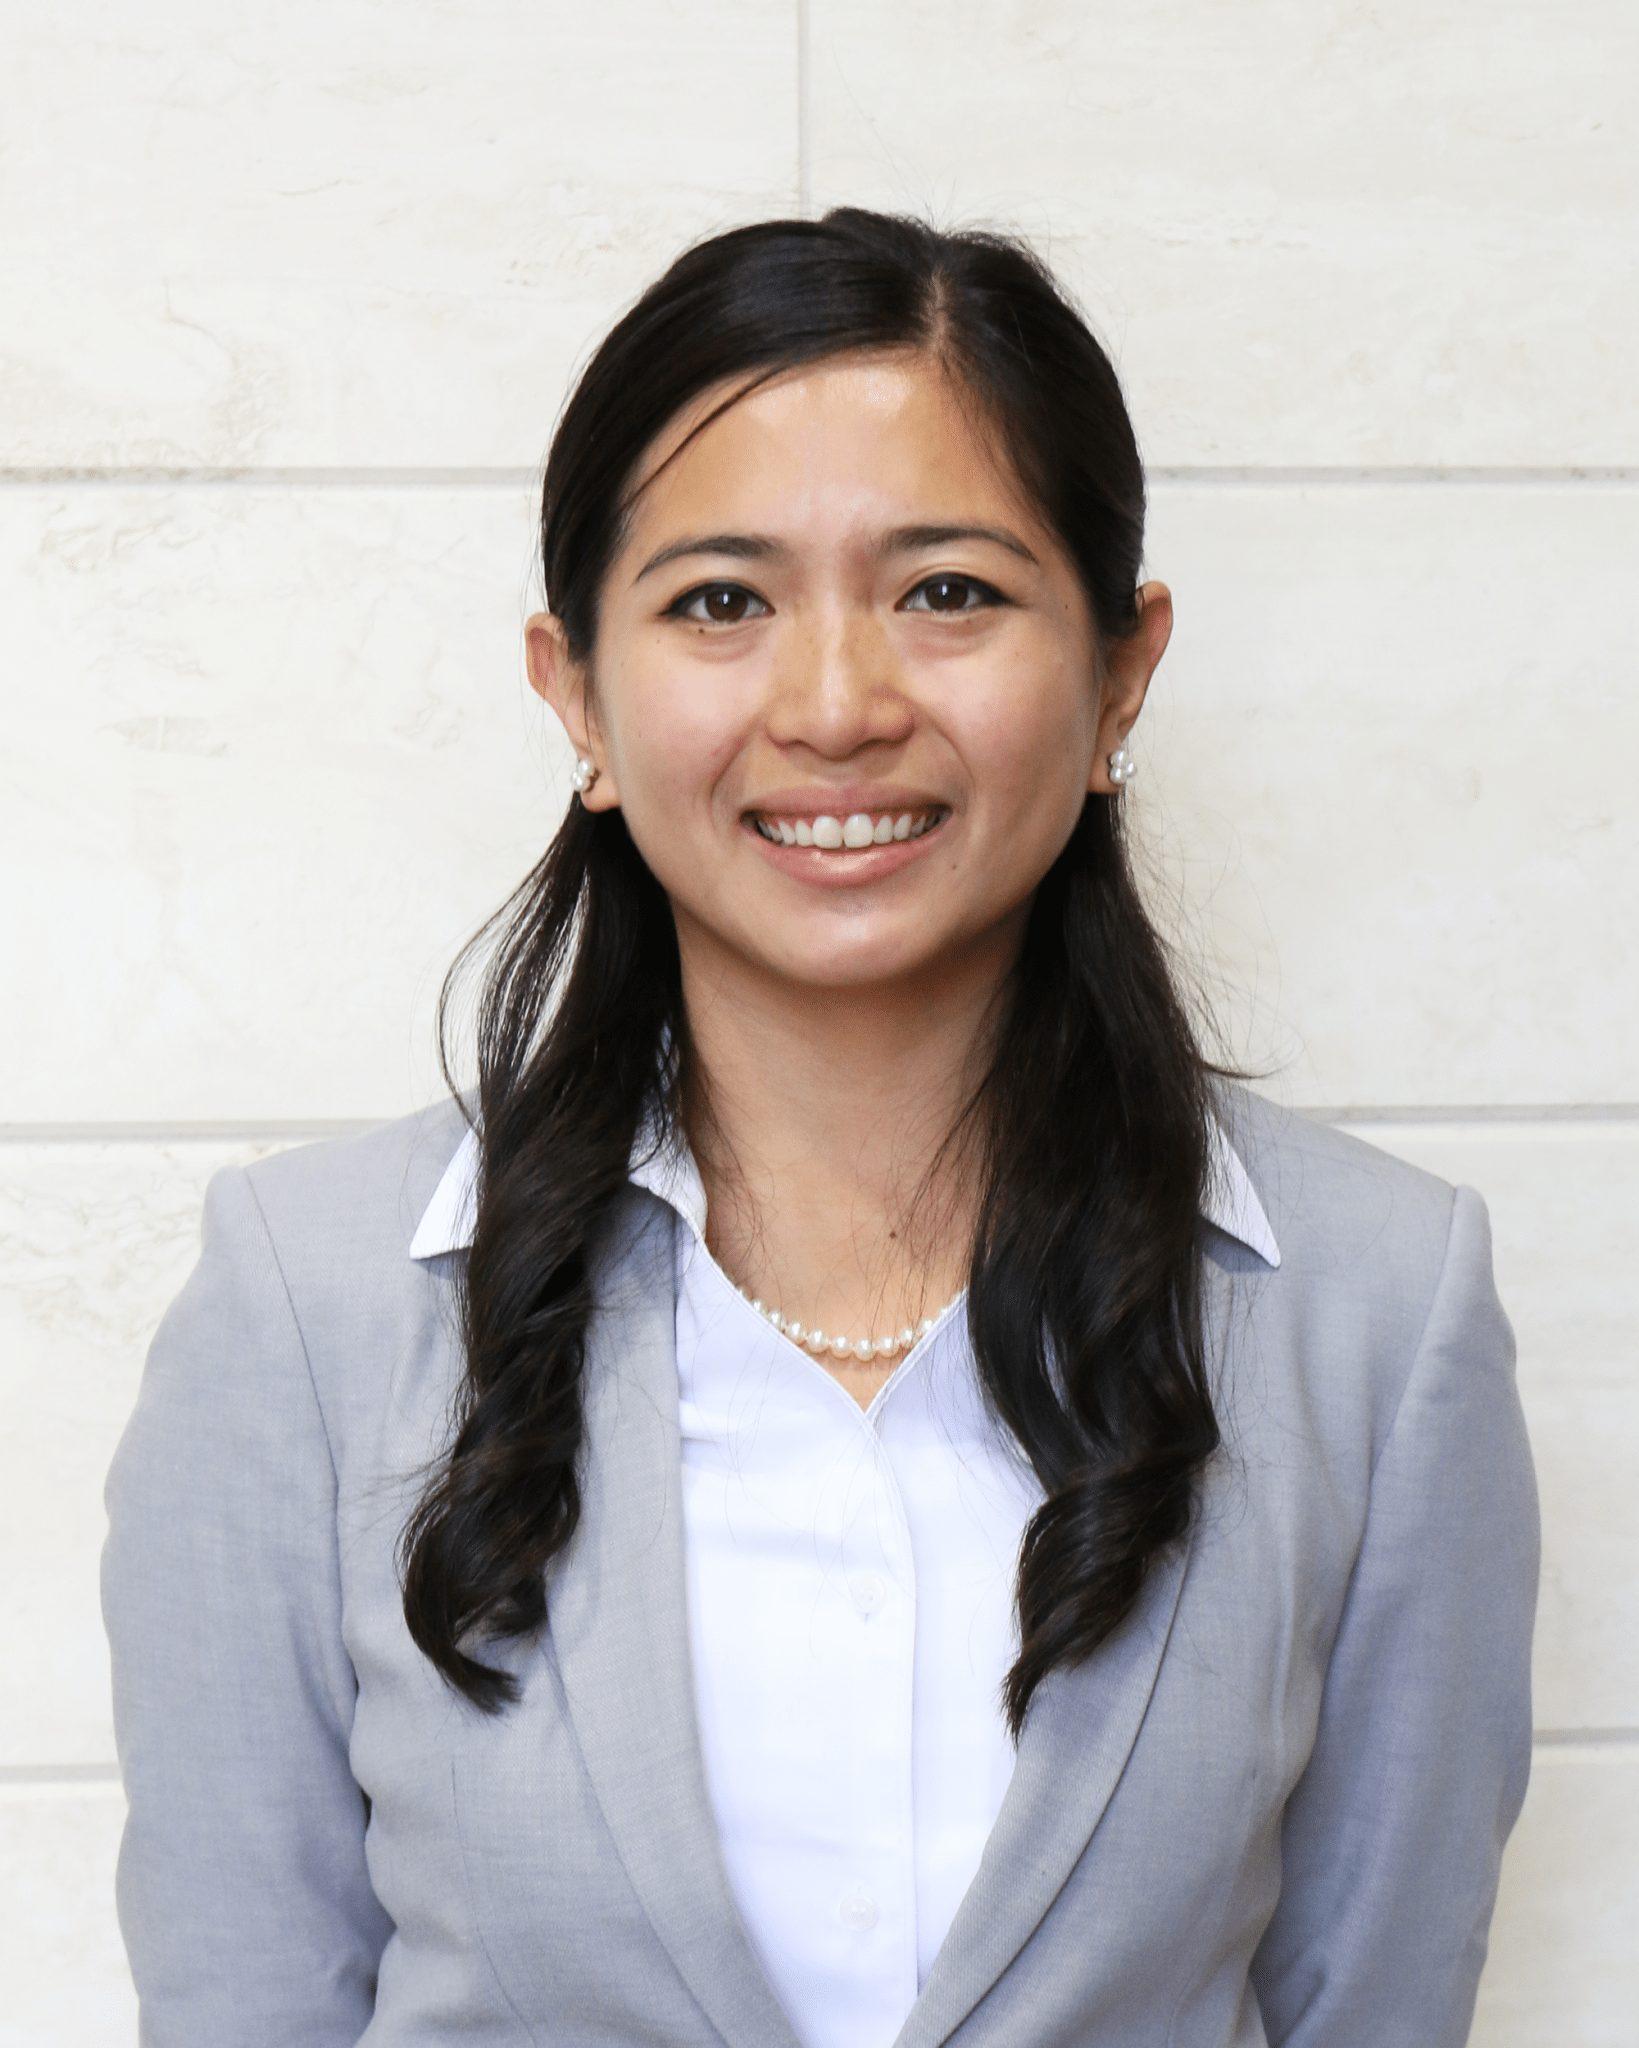 Erika Ngo